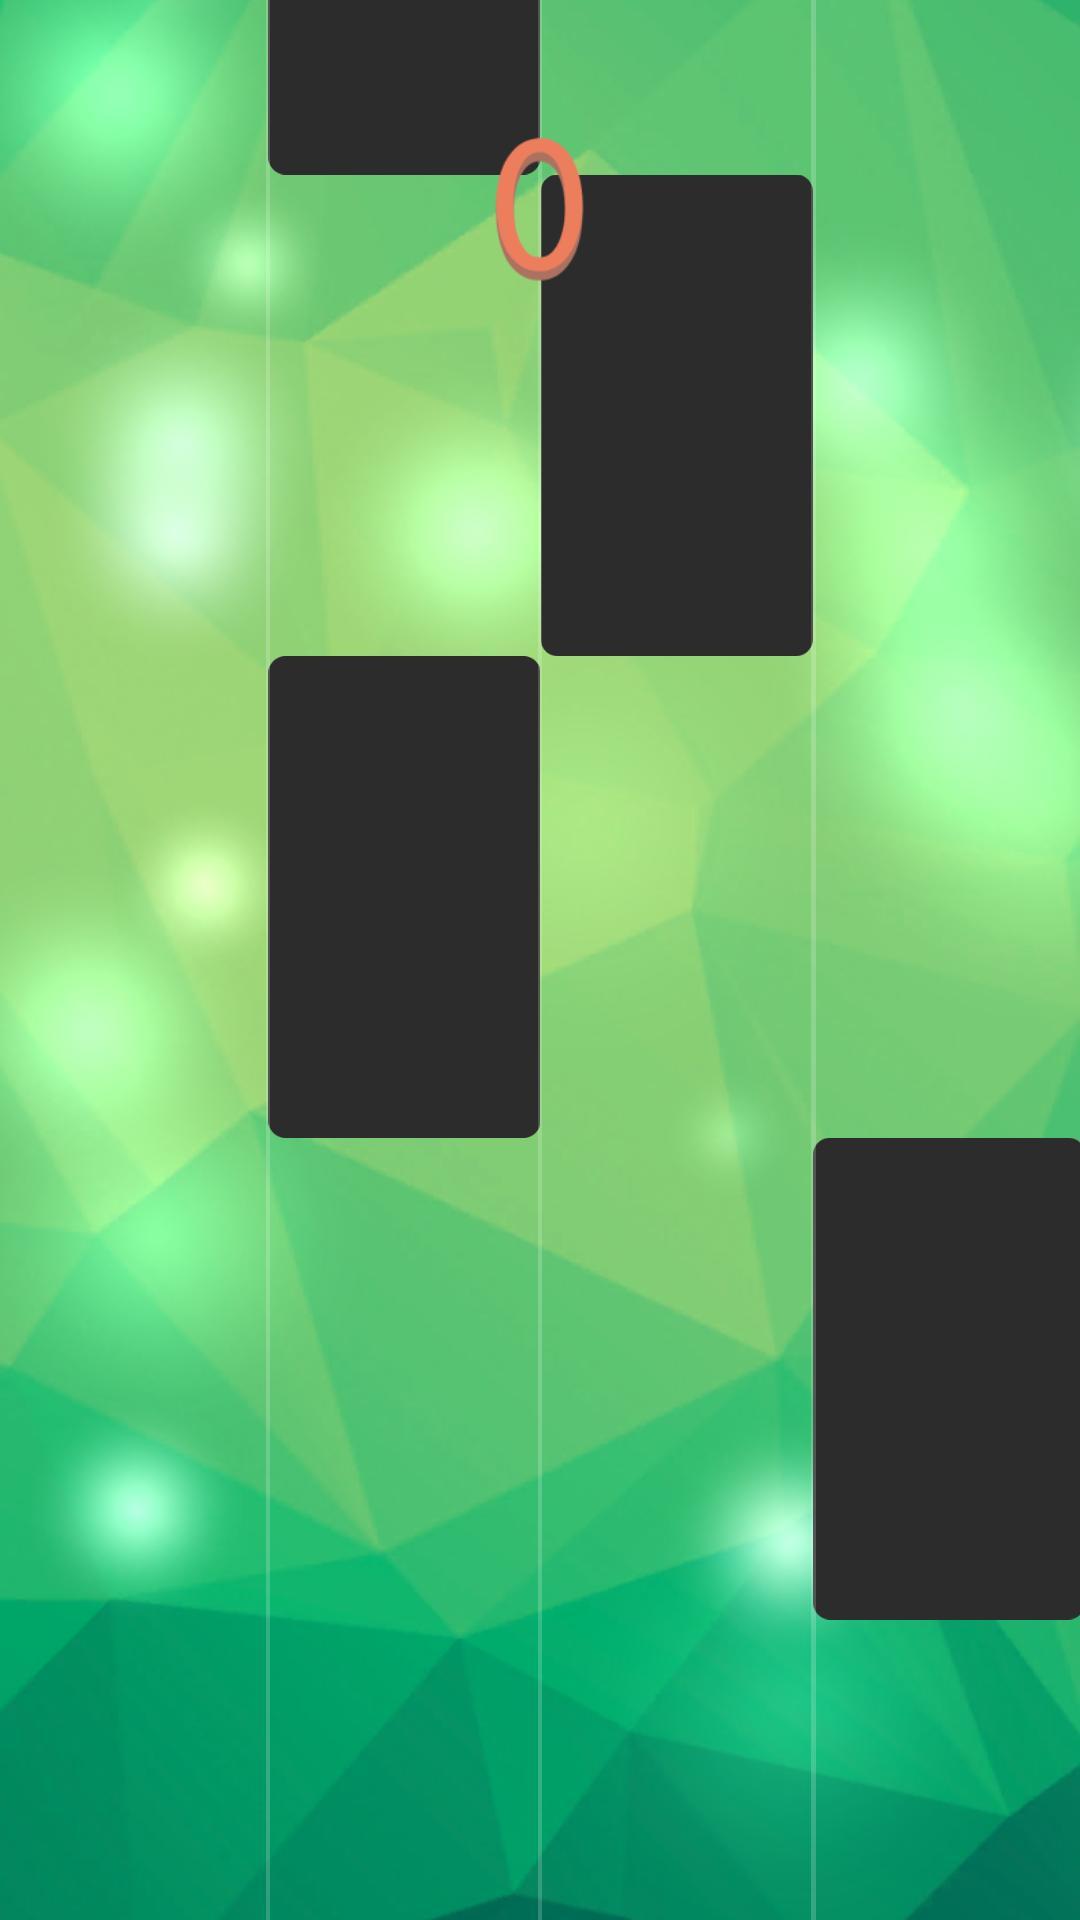 Ed Sheeran - Photograph - Lyrics Piano Tap for Android - APK Download